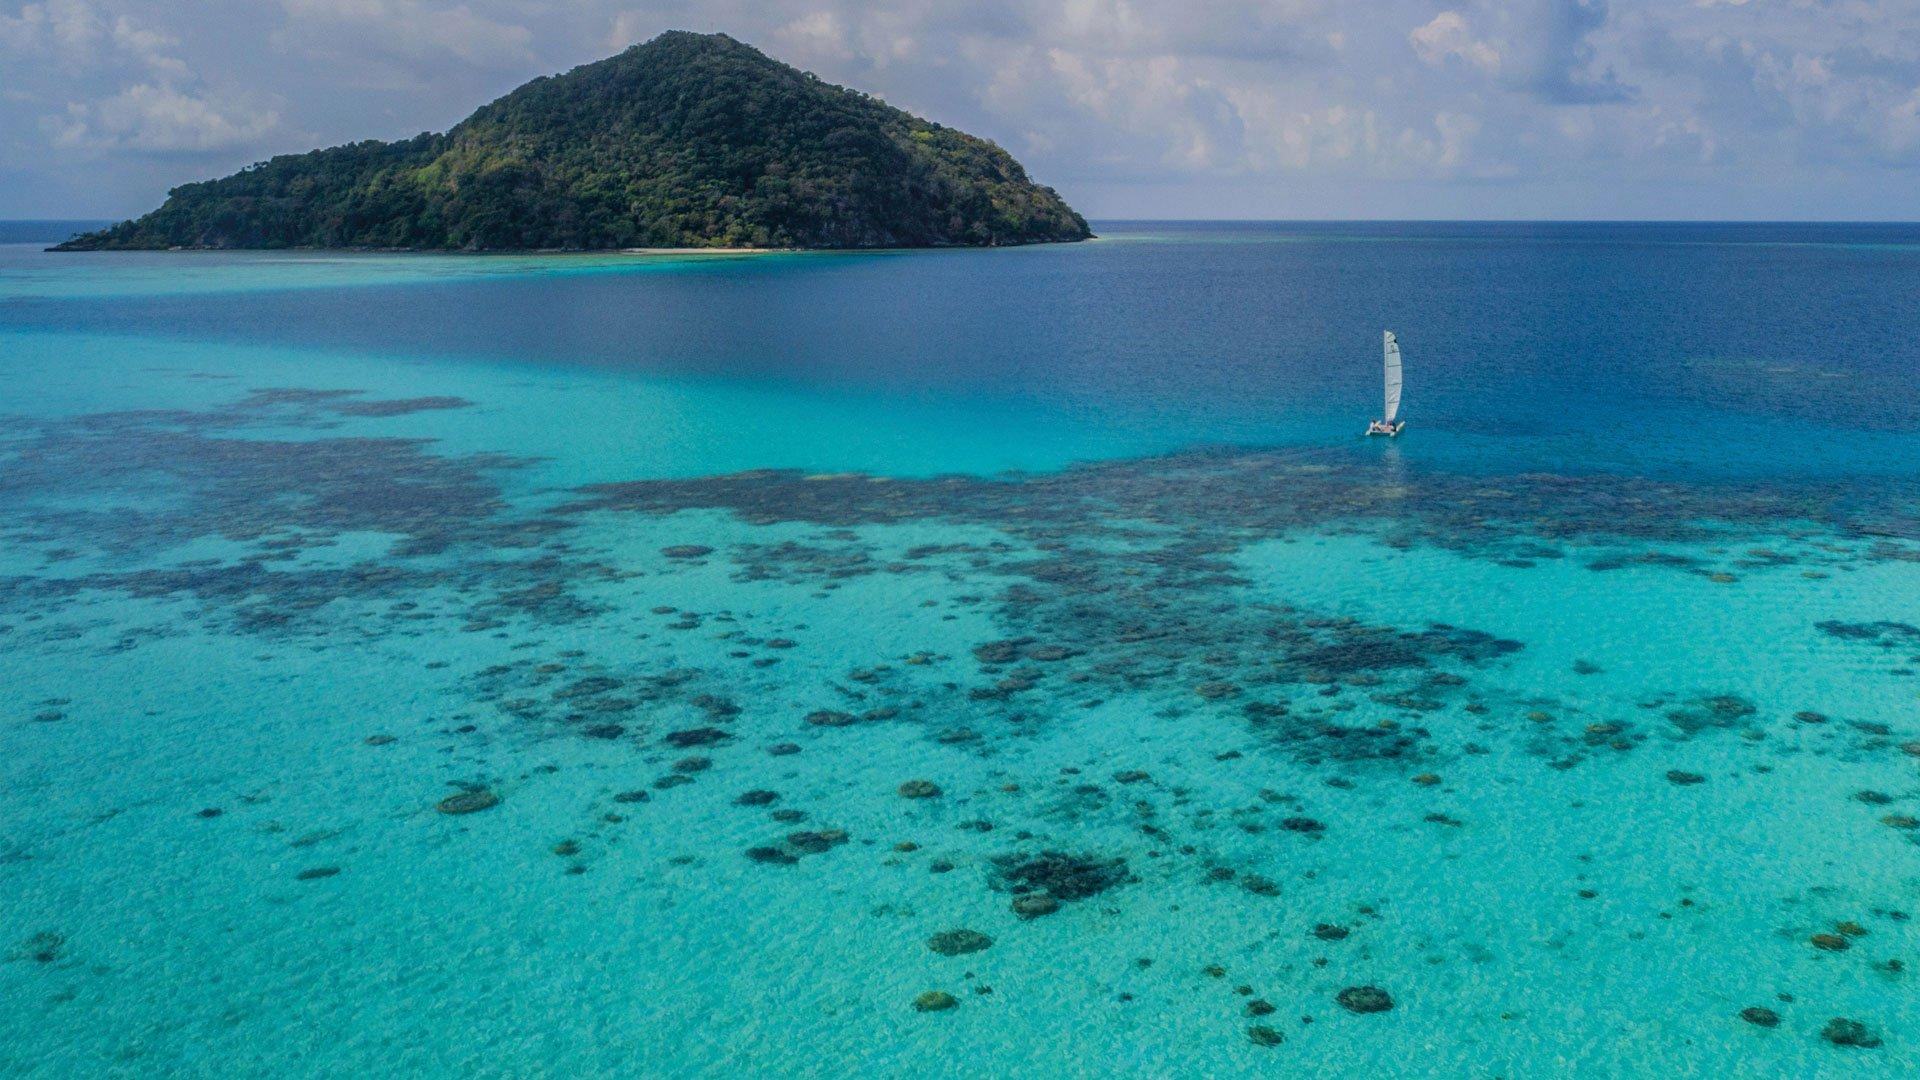 bawahreserve_sailing_in_lagoon_zoom